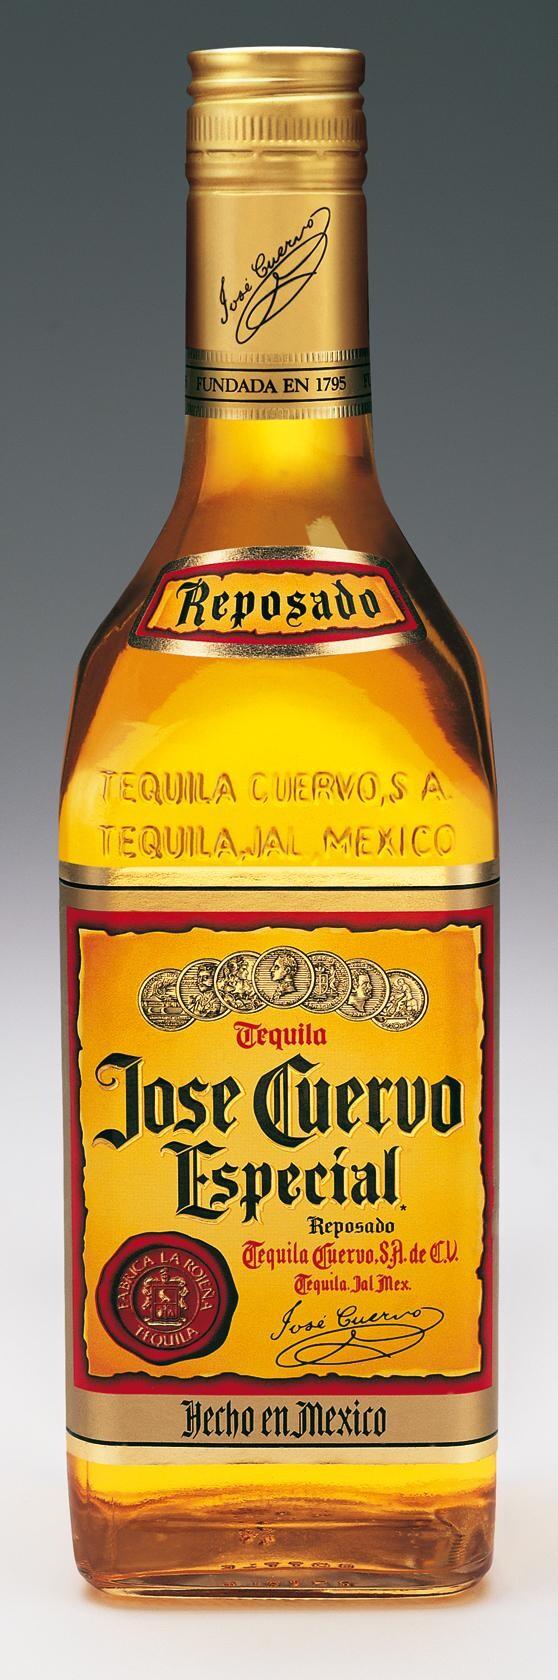 Tequila Jose Cuervo Gold Especial Reposado 1L 38%